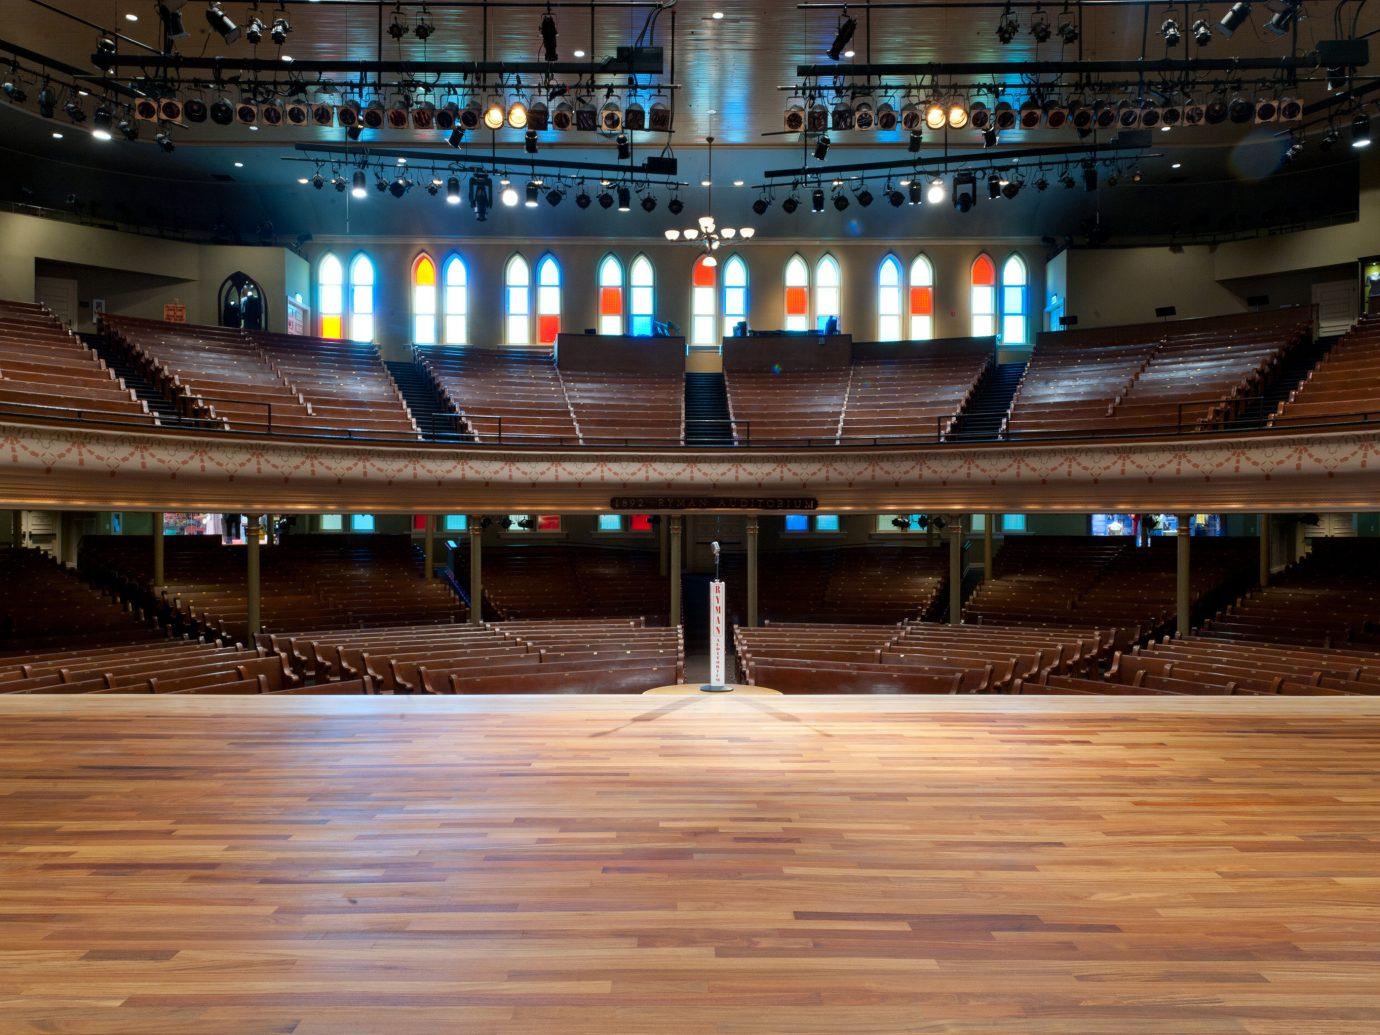 Arts + Culture Austin Nashville Trip Ideas building indoor floor structure auditorium night sport venue wood shape arena line several